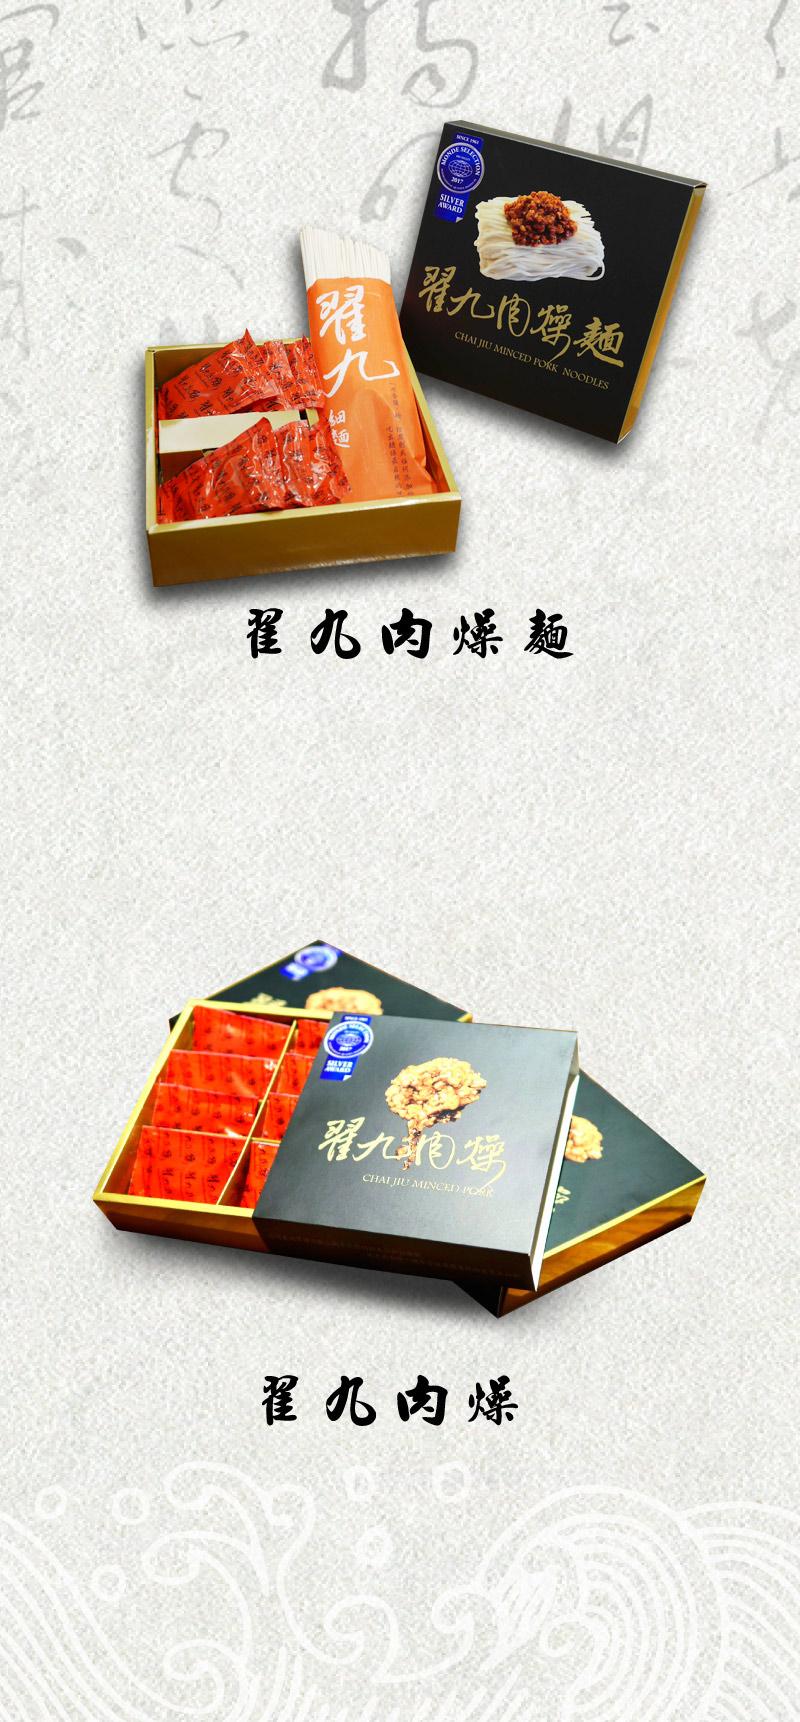 http://chai9.com/wp-content/uploads/banner2_m-10104.jpg